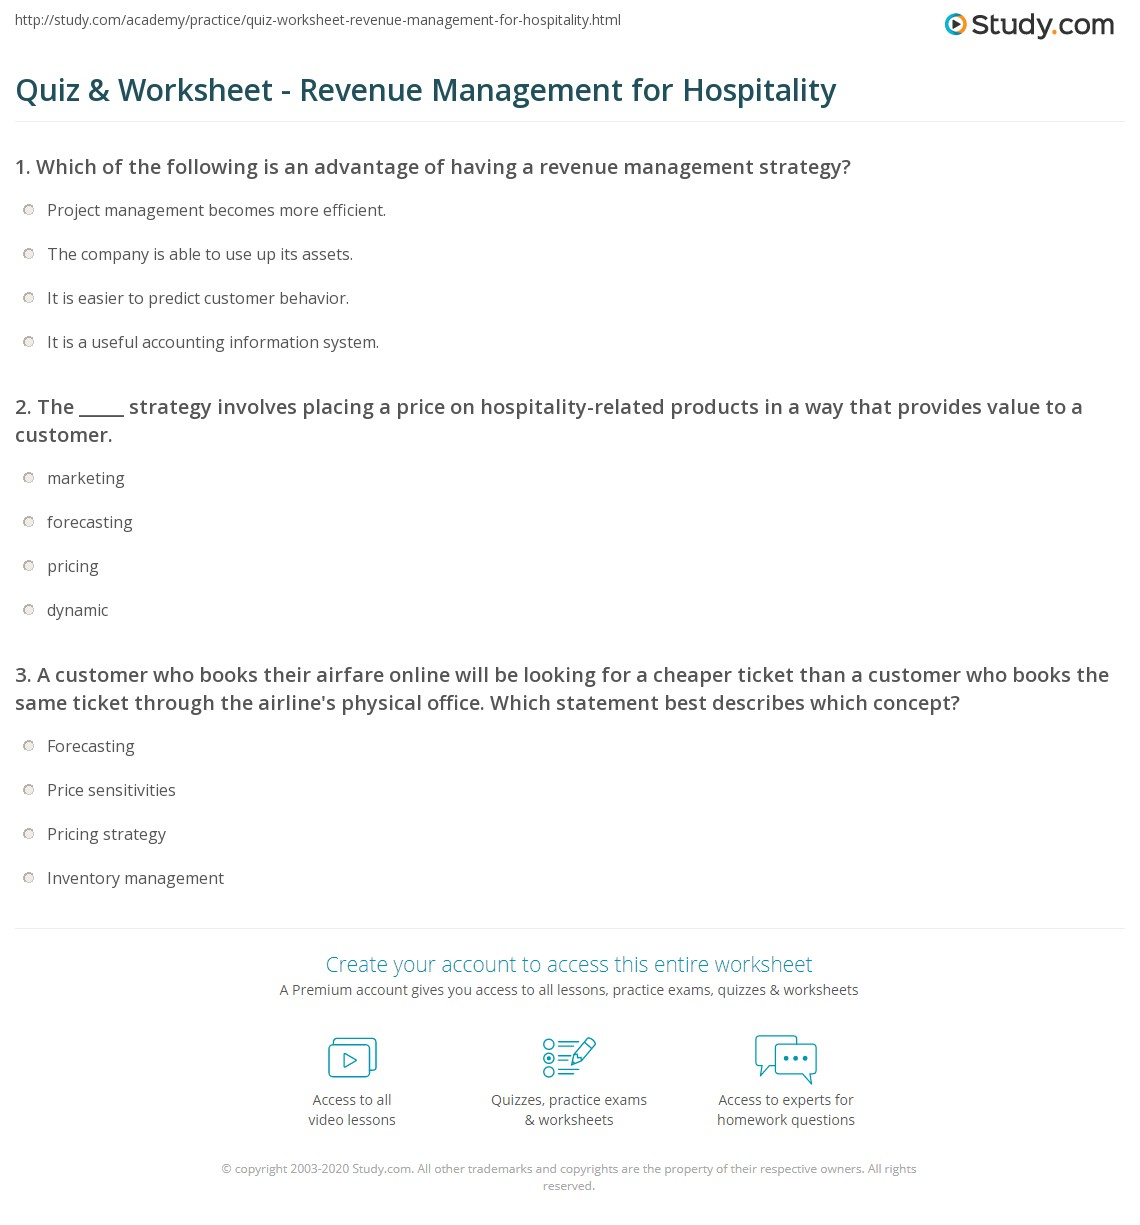 Quiz & Worksheet - Revenue Management for Hospitality | Study.com